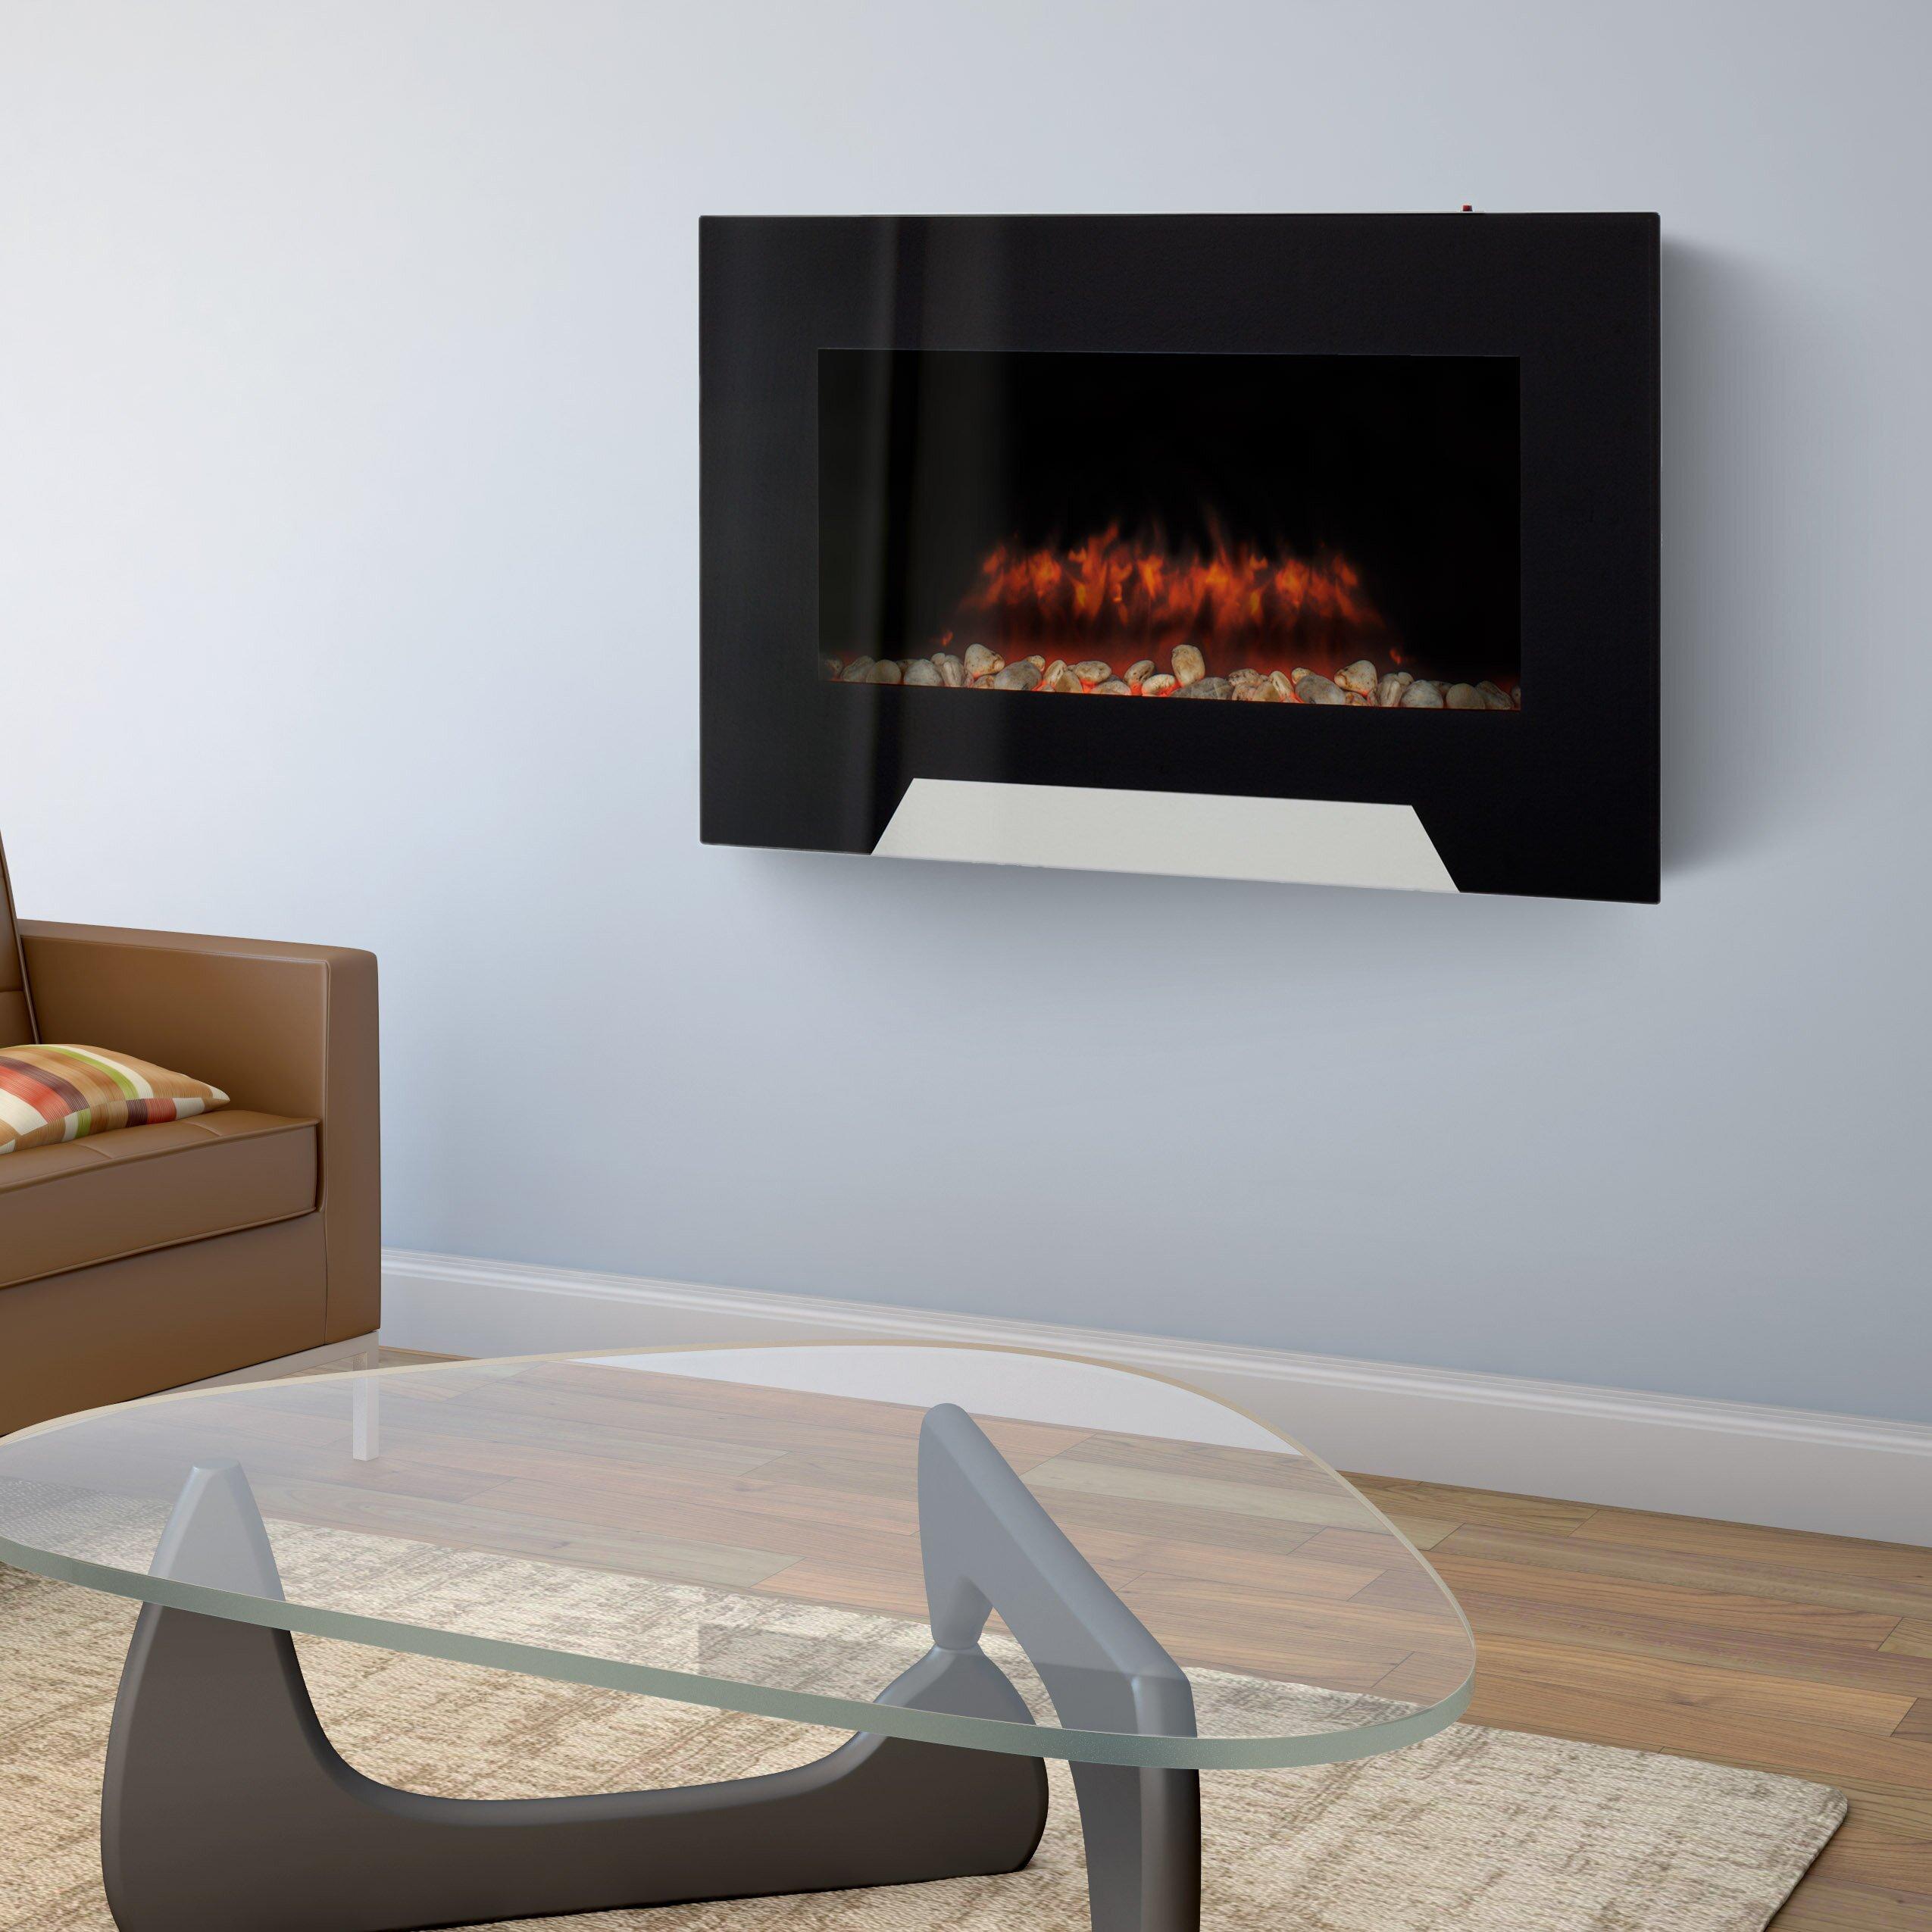 Corliving Wall Mount Electric Fireplace Reviews Wayfair